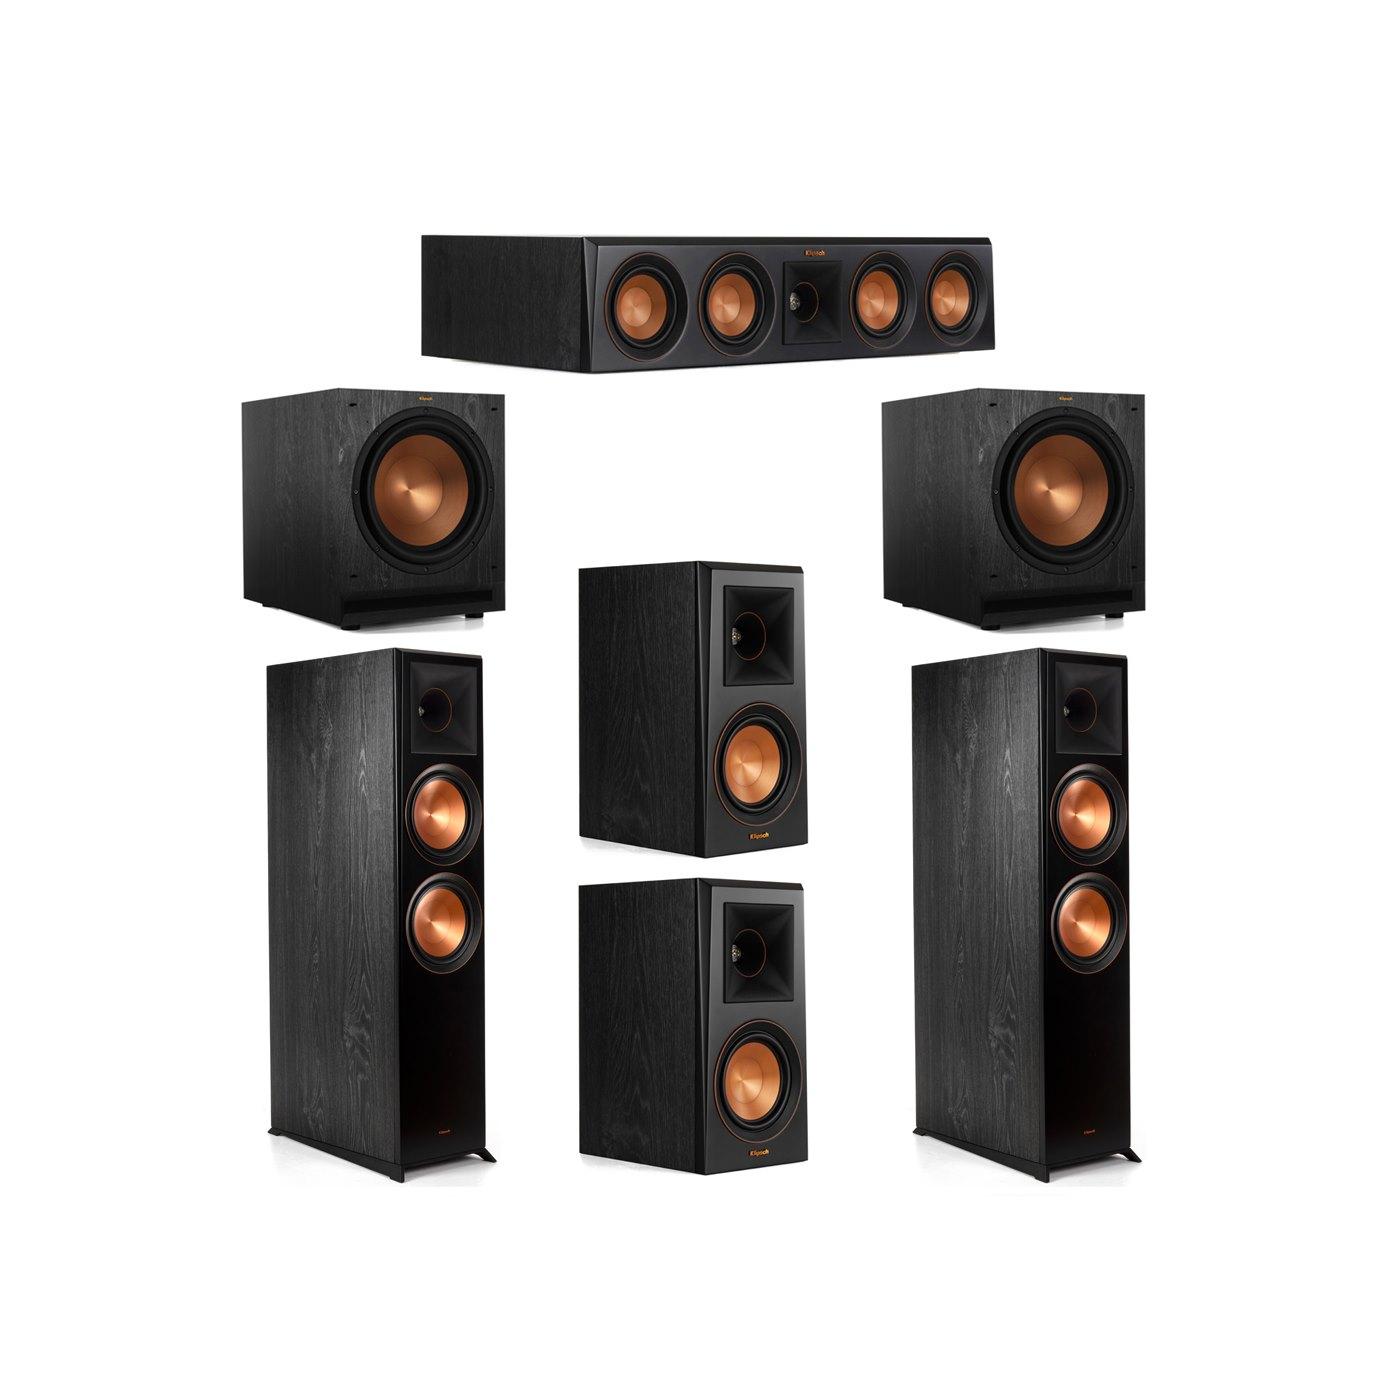 Klipsch 5.2 System with 2 RP-8000F Floorstanding Speakers, 1 Klipsch RP-404C Center Speaker, 2 Klipsch RP-500M Surround Speakers, 2 Klipsch SPL-120 Subwoofers